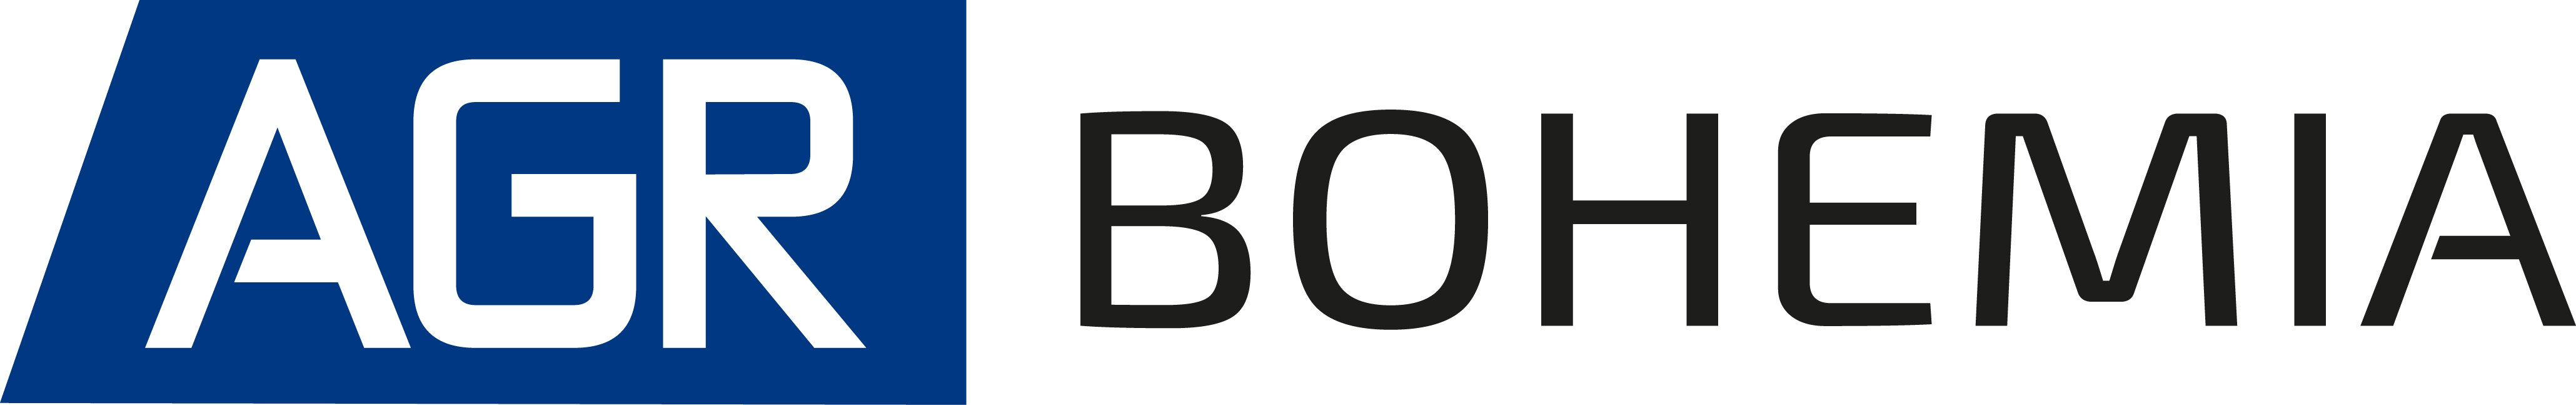 AGR Bohemia s.r.o.